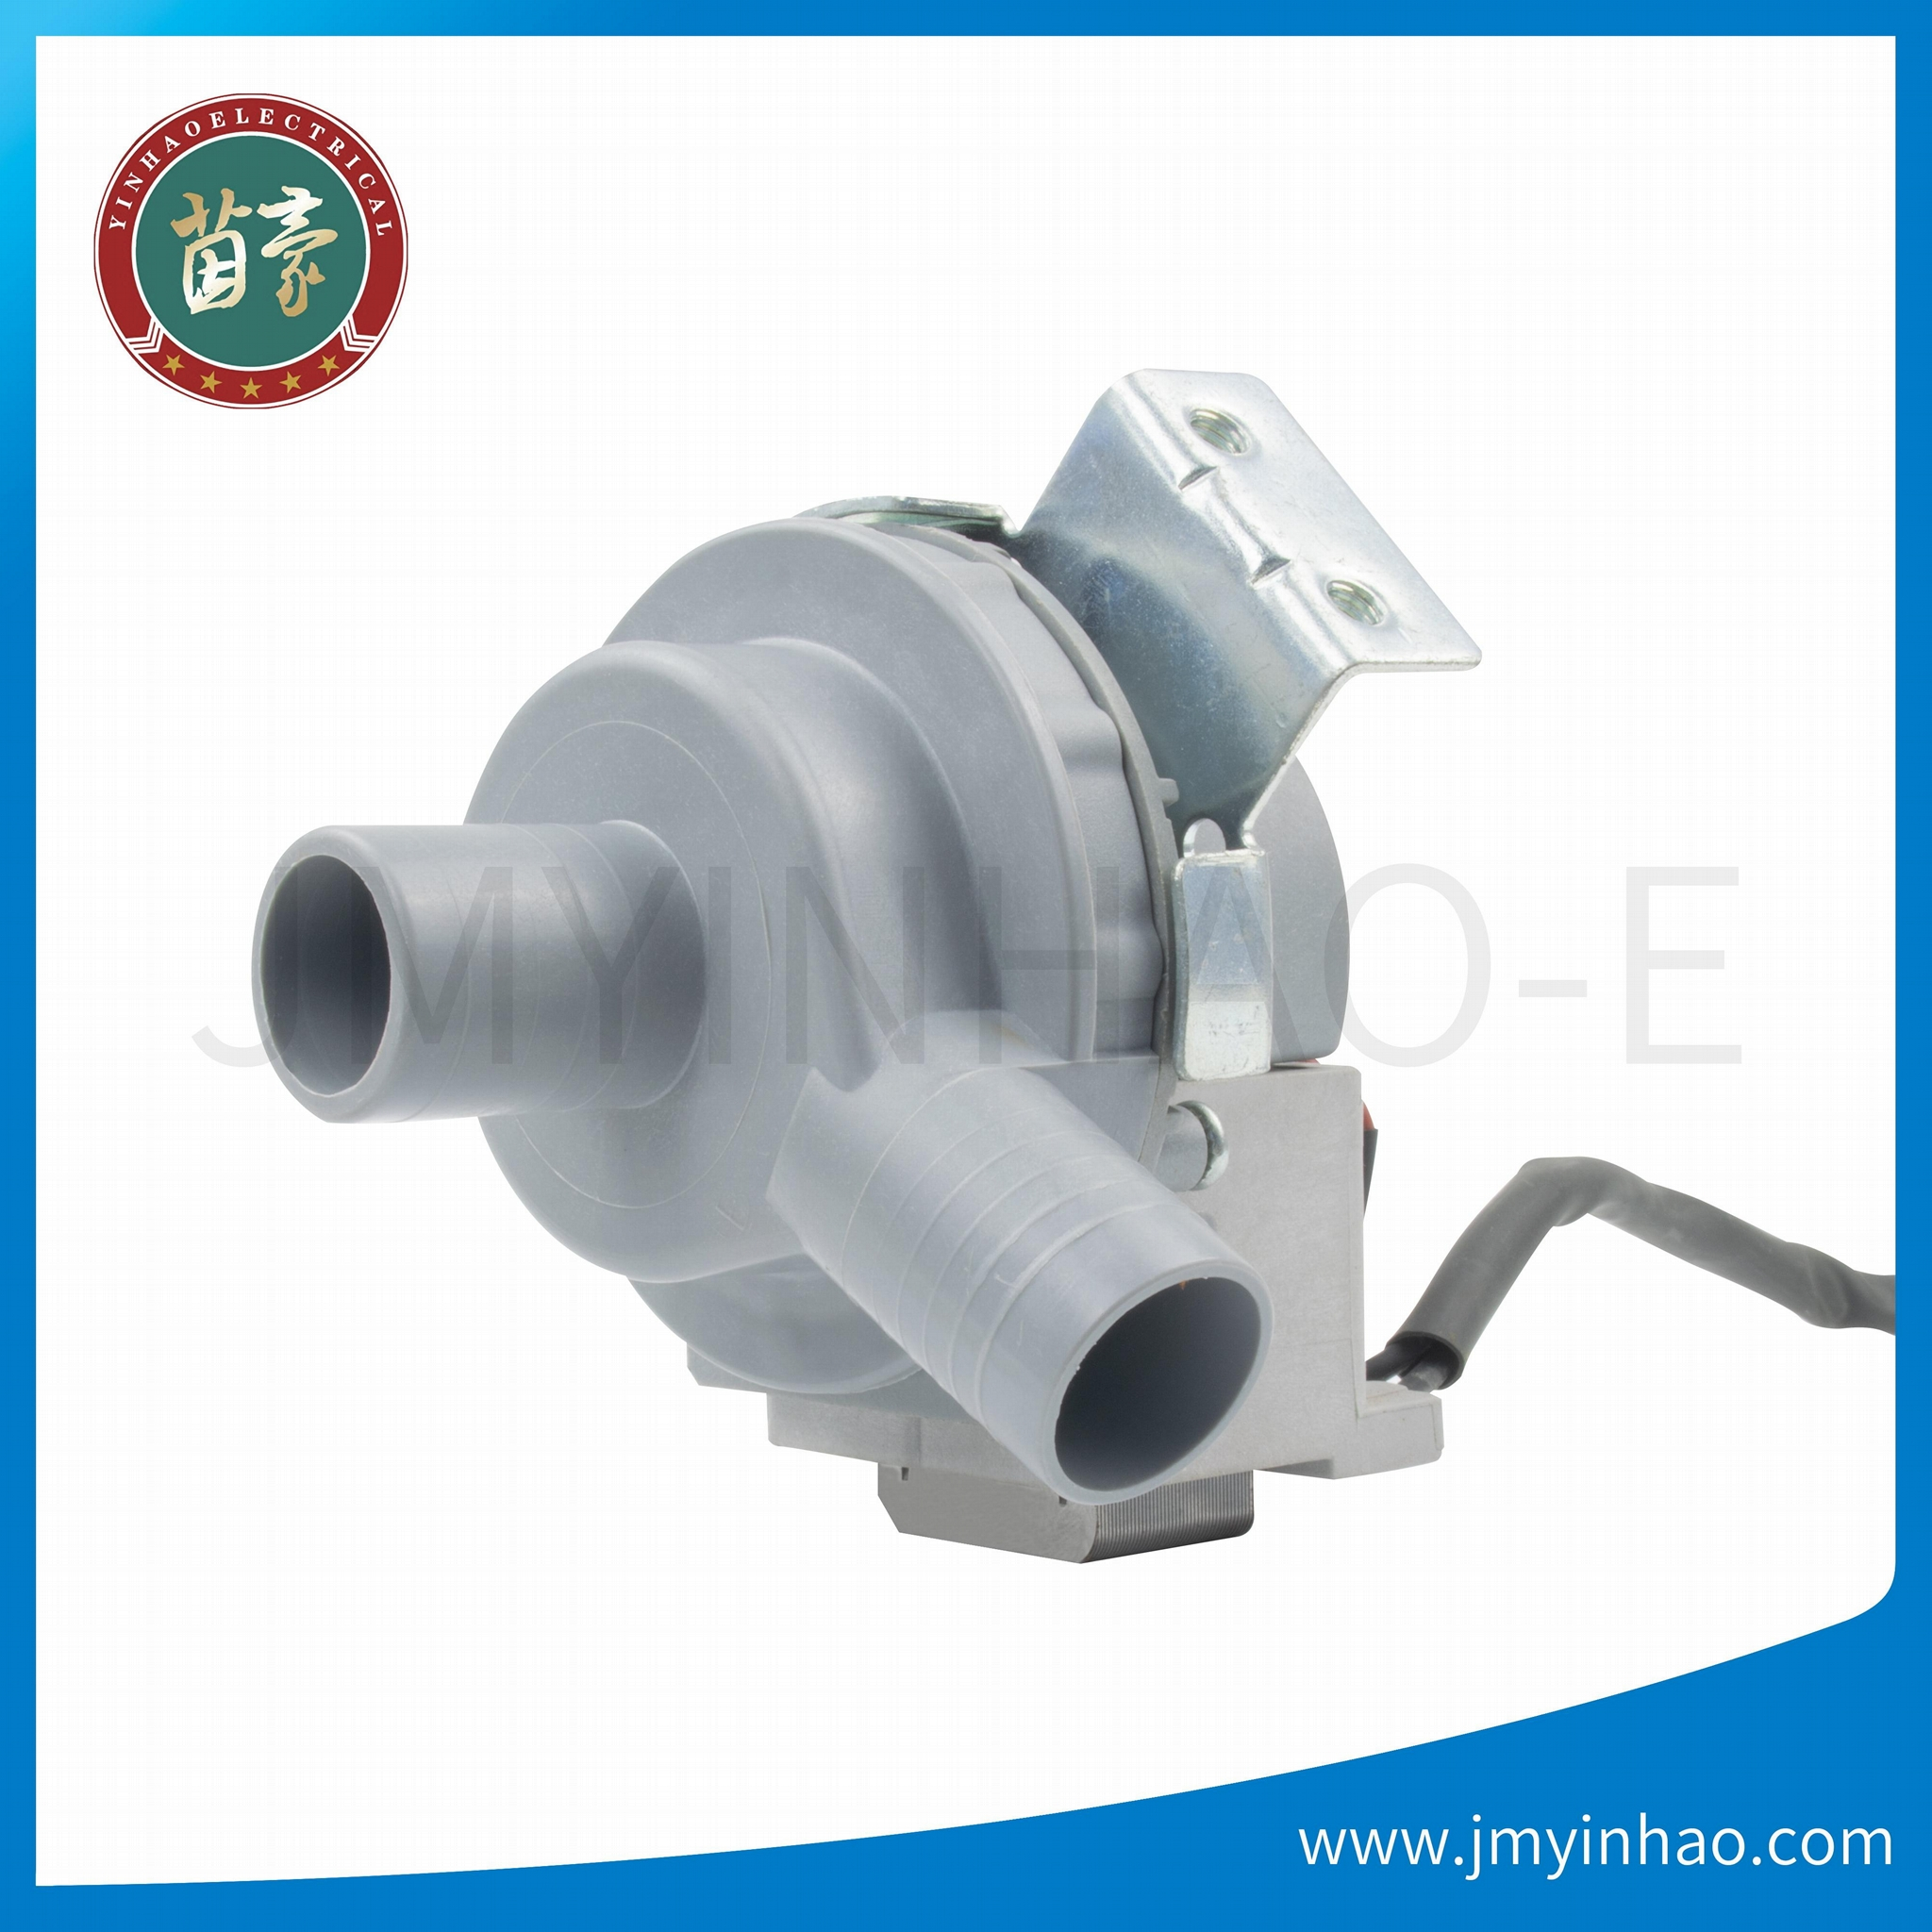 220V Magnetic Pump / Drain Pump for Washing Machine 1